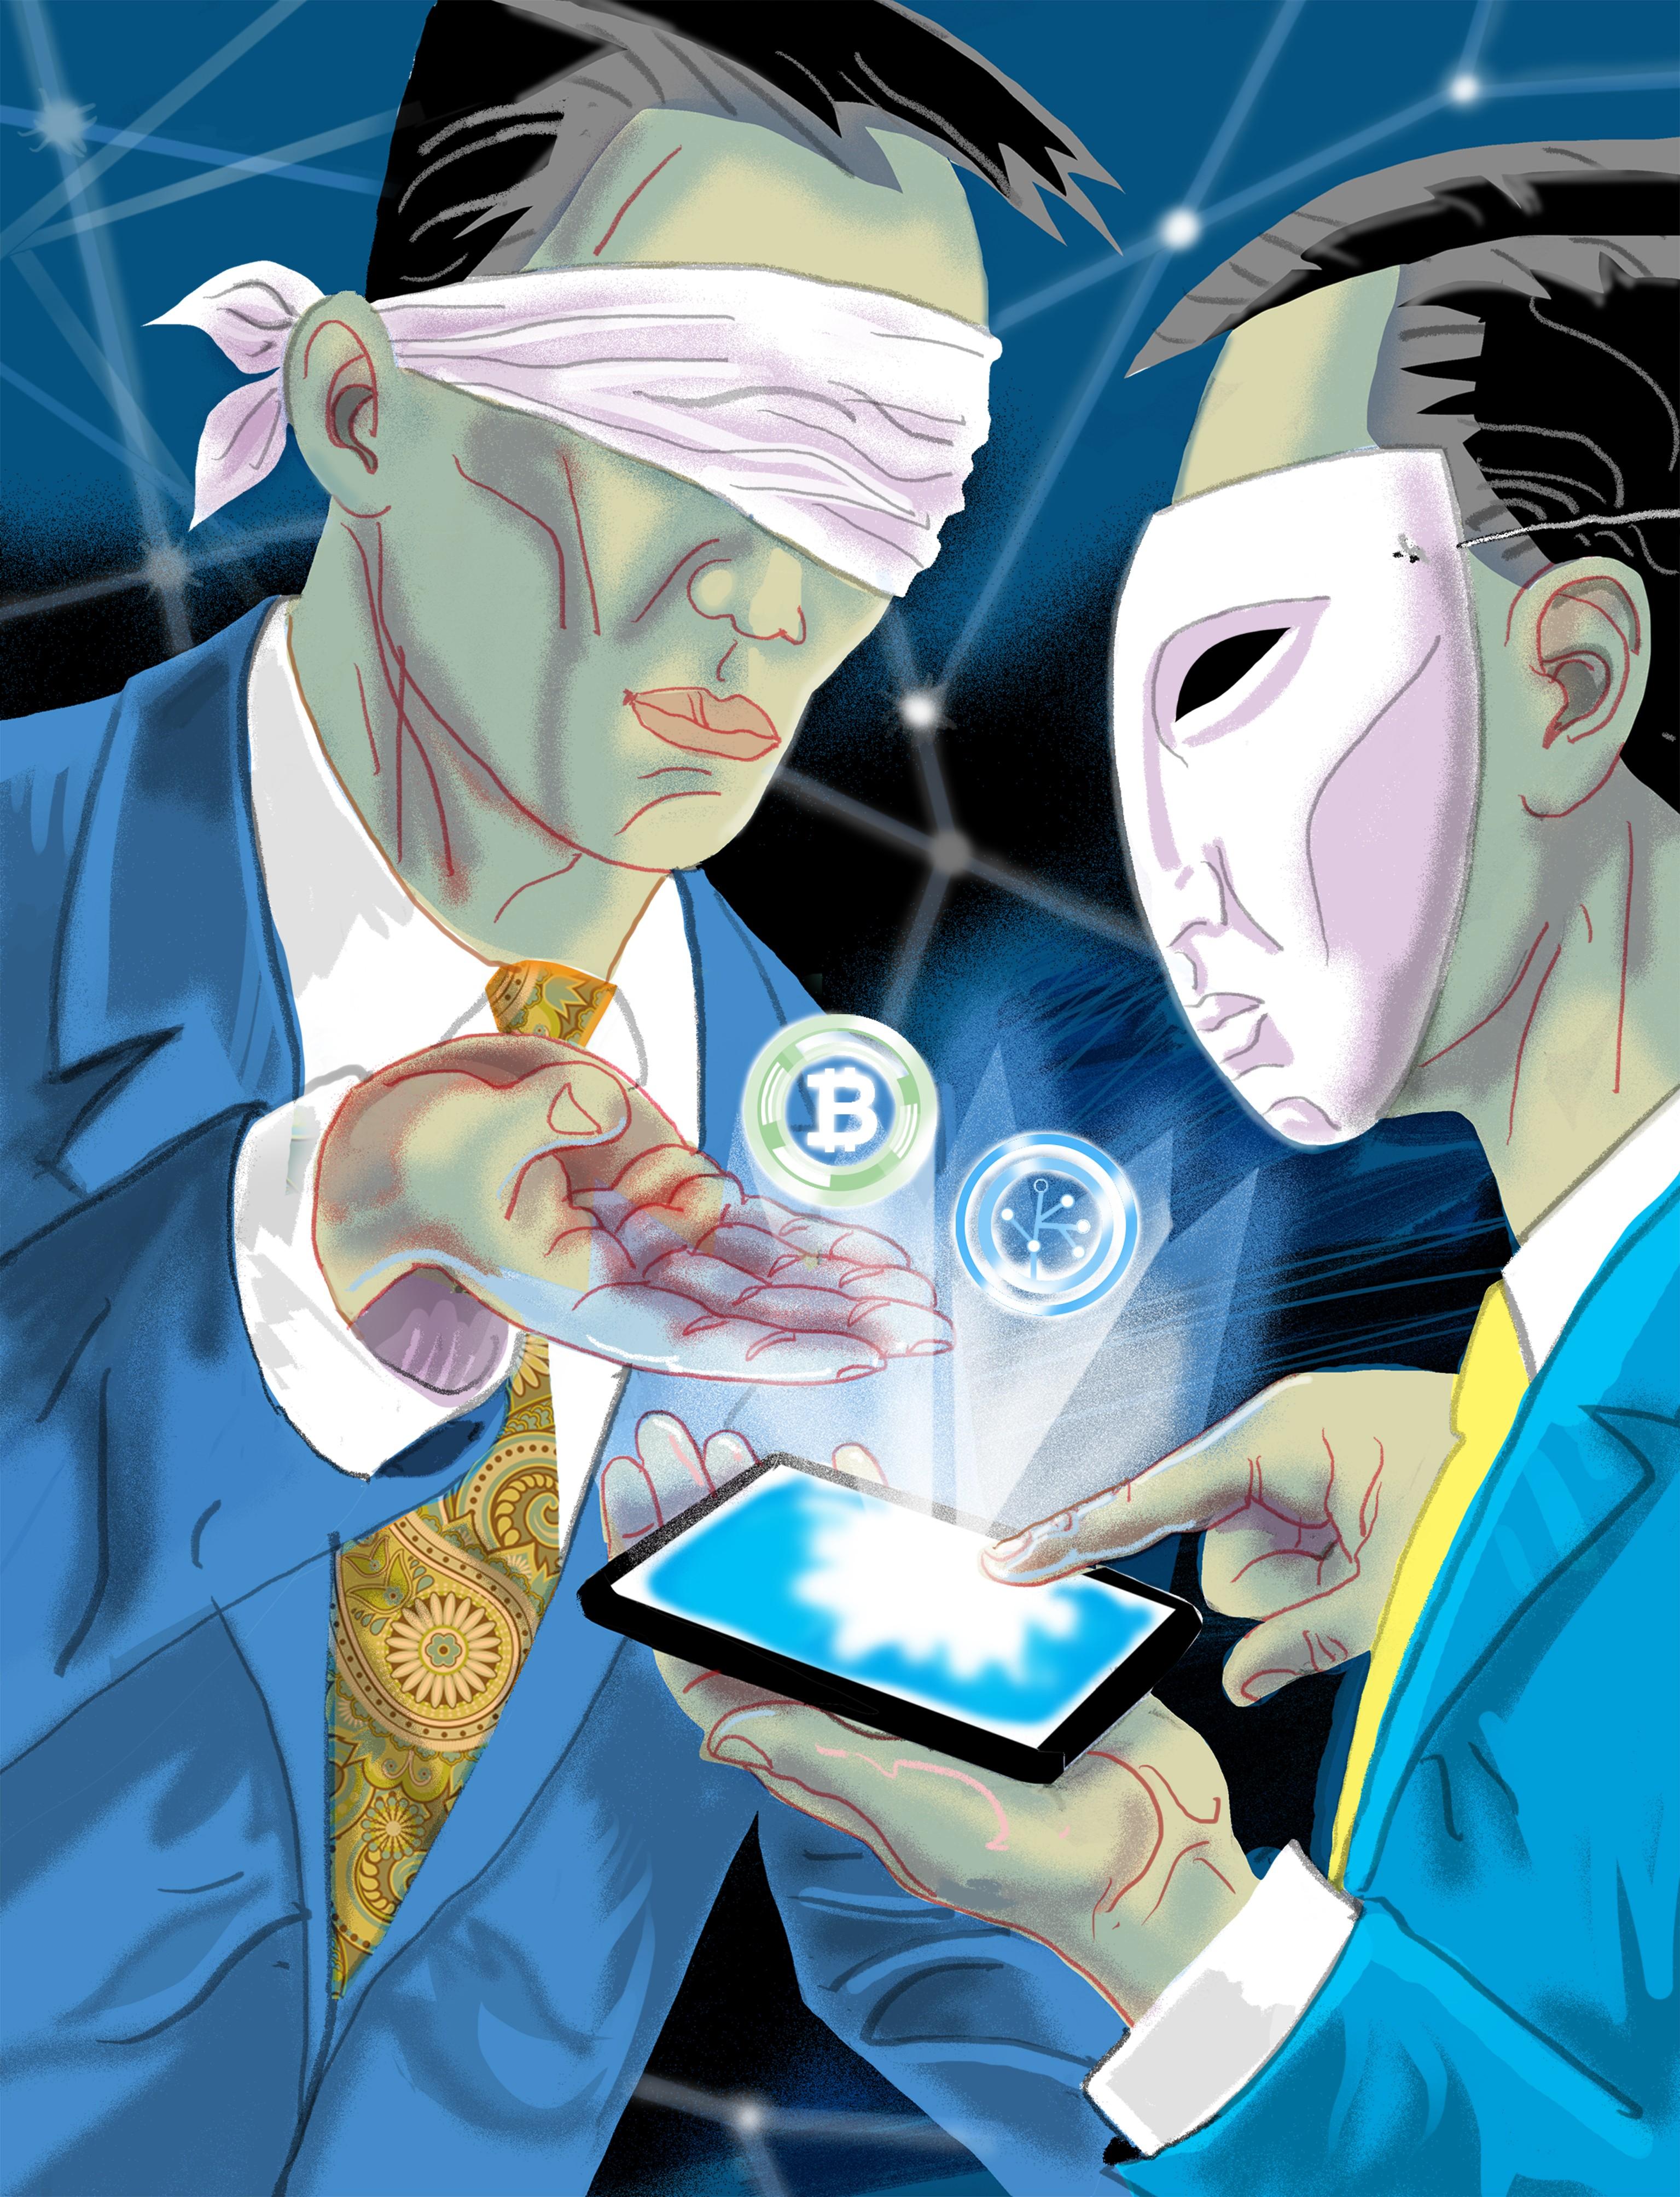 Bitcoin billionaires translate digital wealth into real world assets illustration craig stephens ccuart Gallery